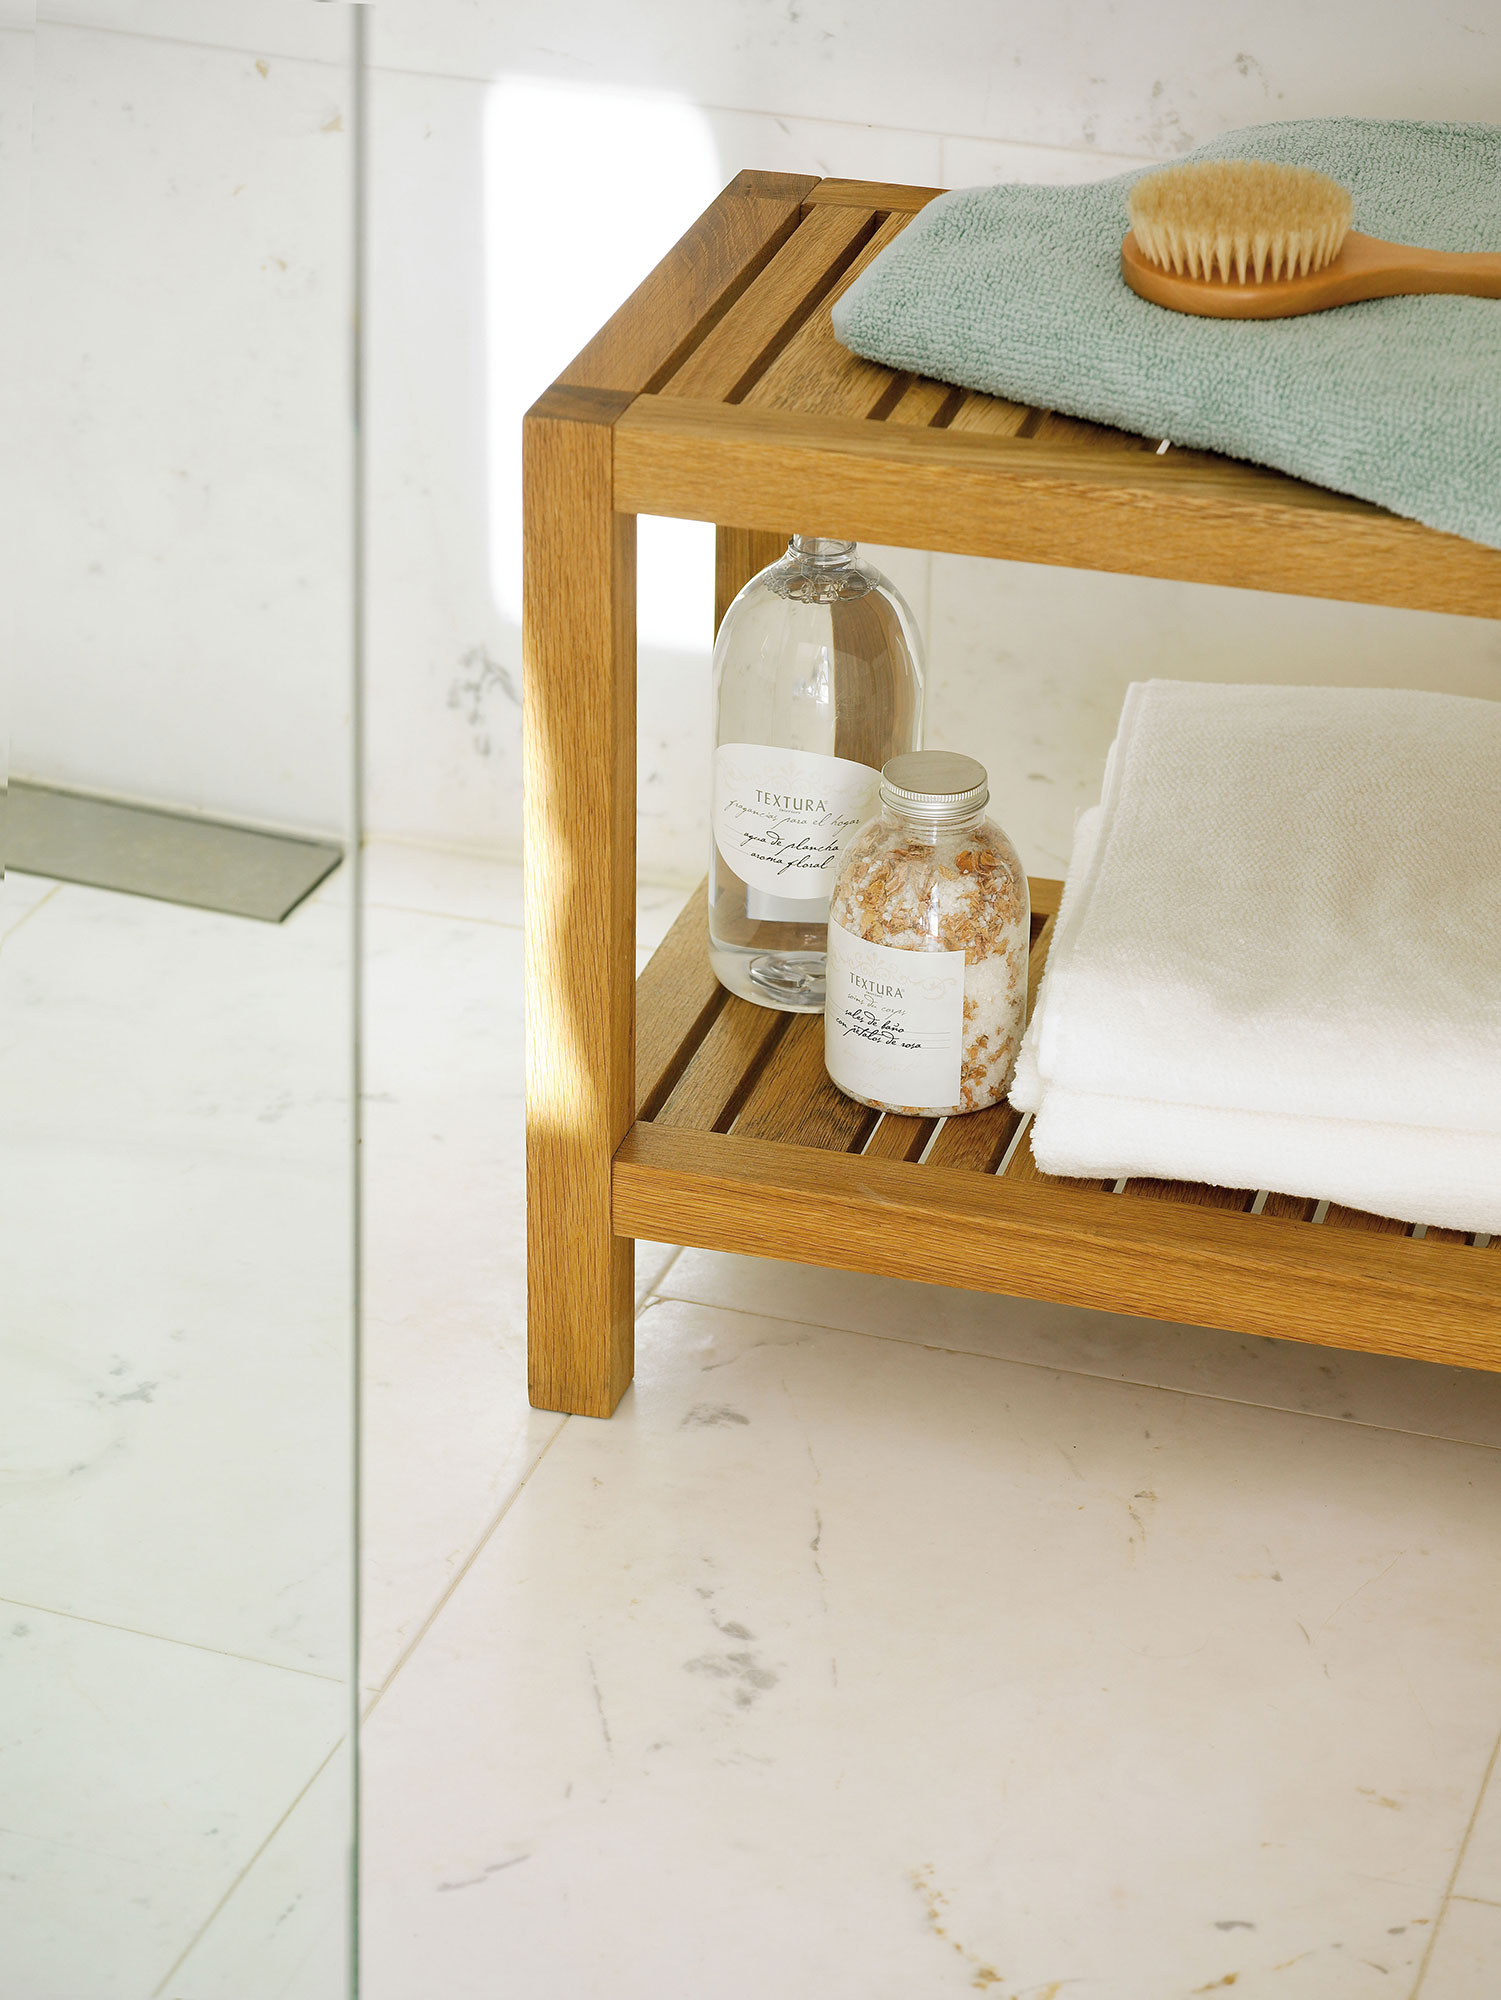 Trucos naturales para mantener el ba o impecable for Trucos para limpiar el bano